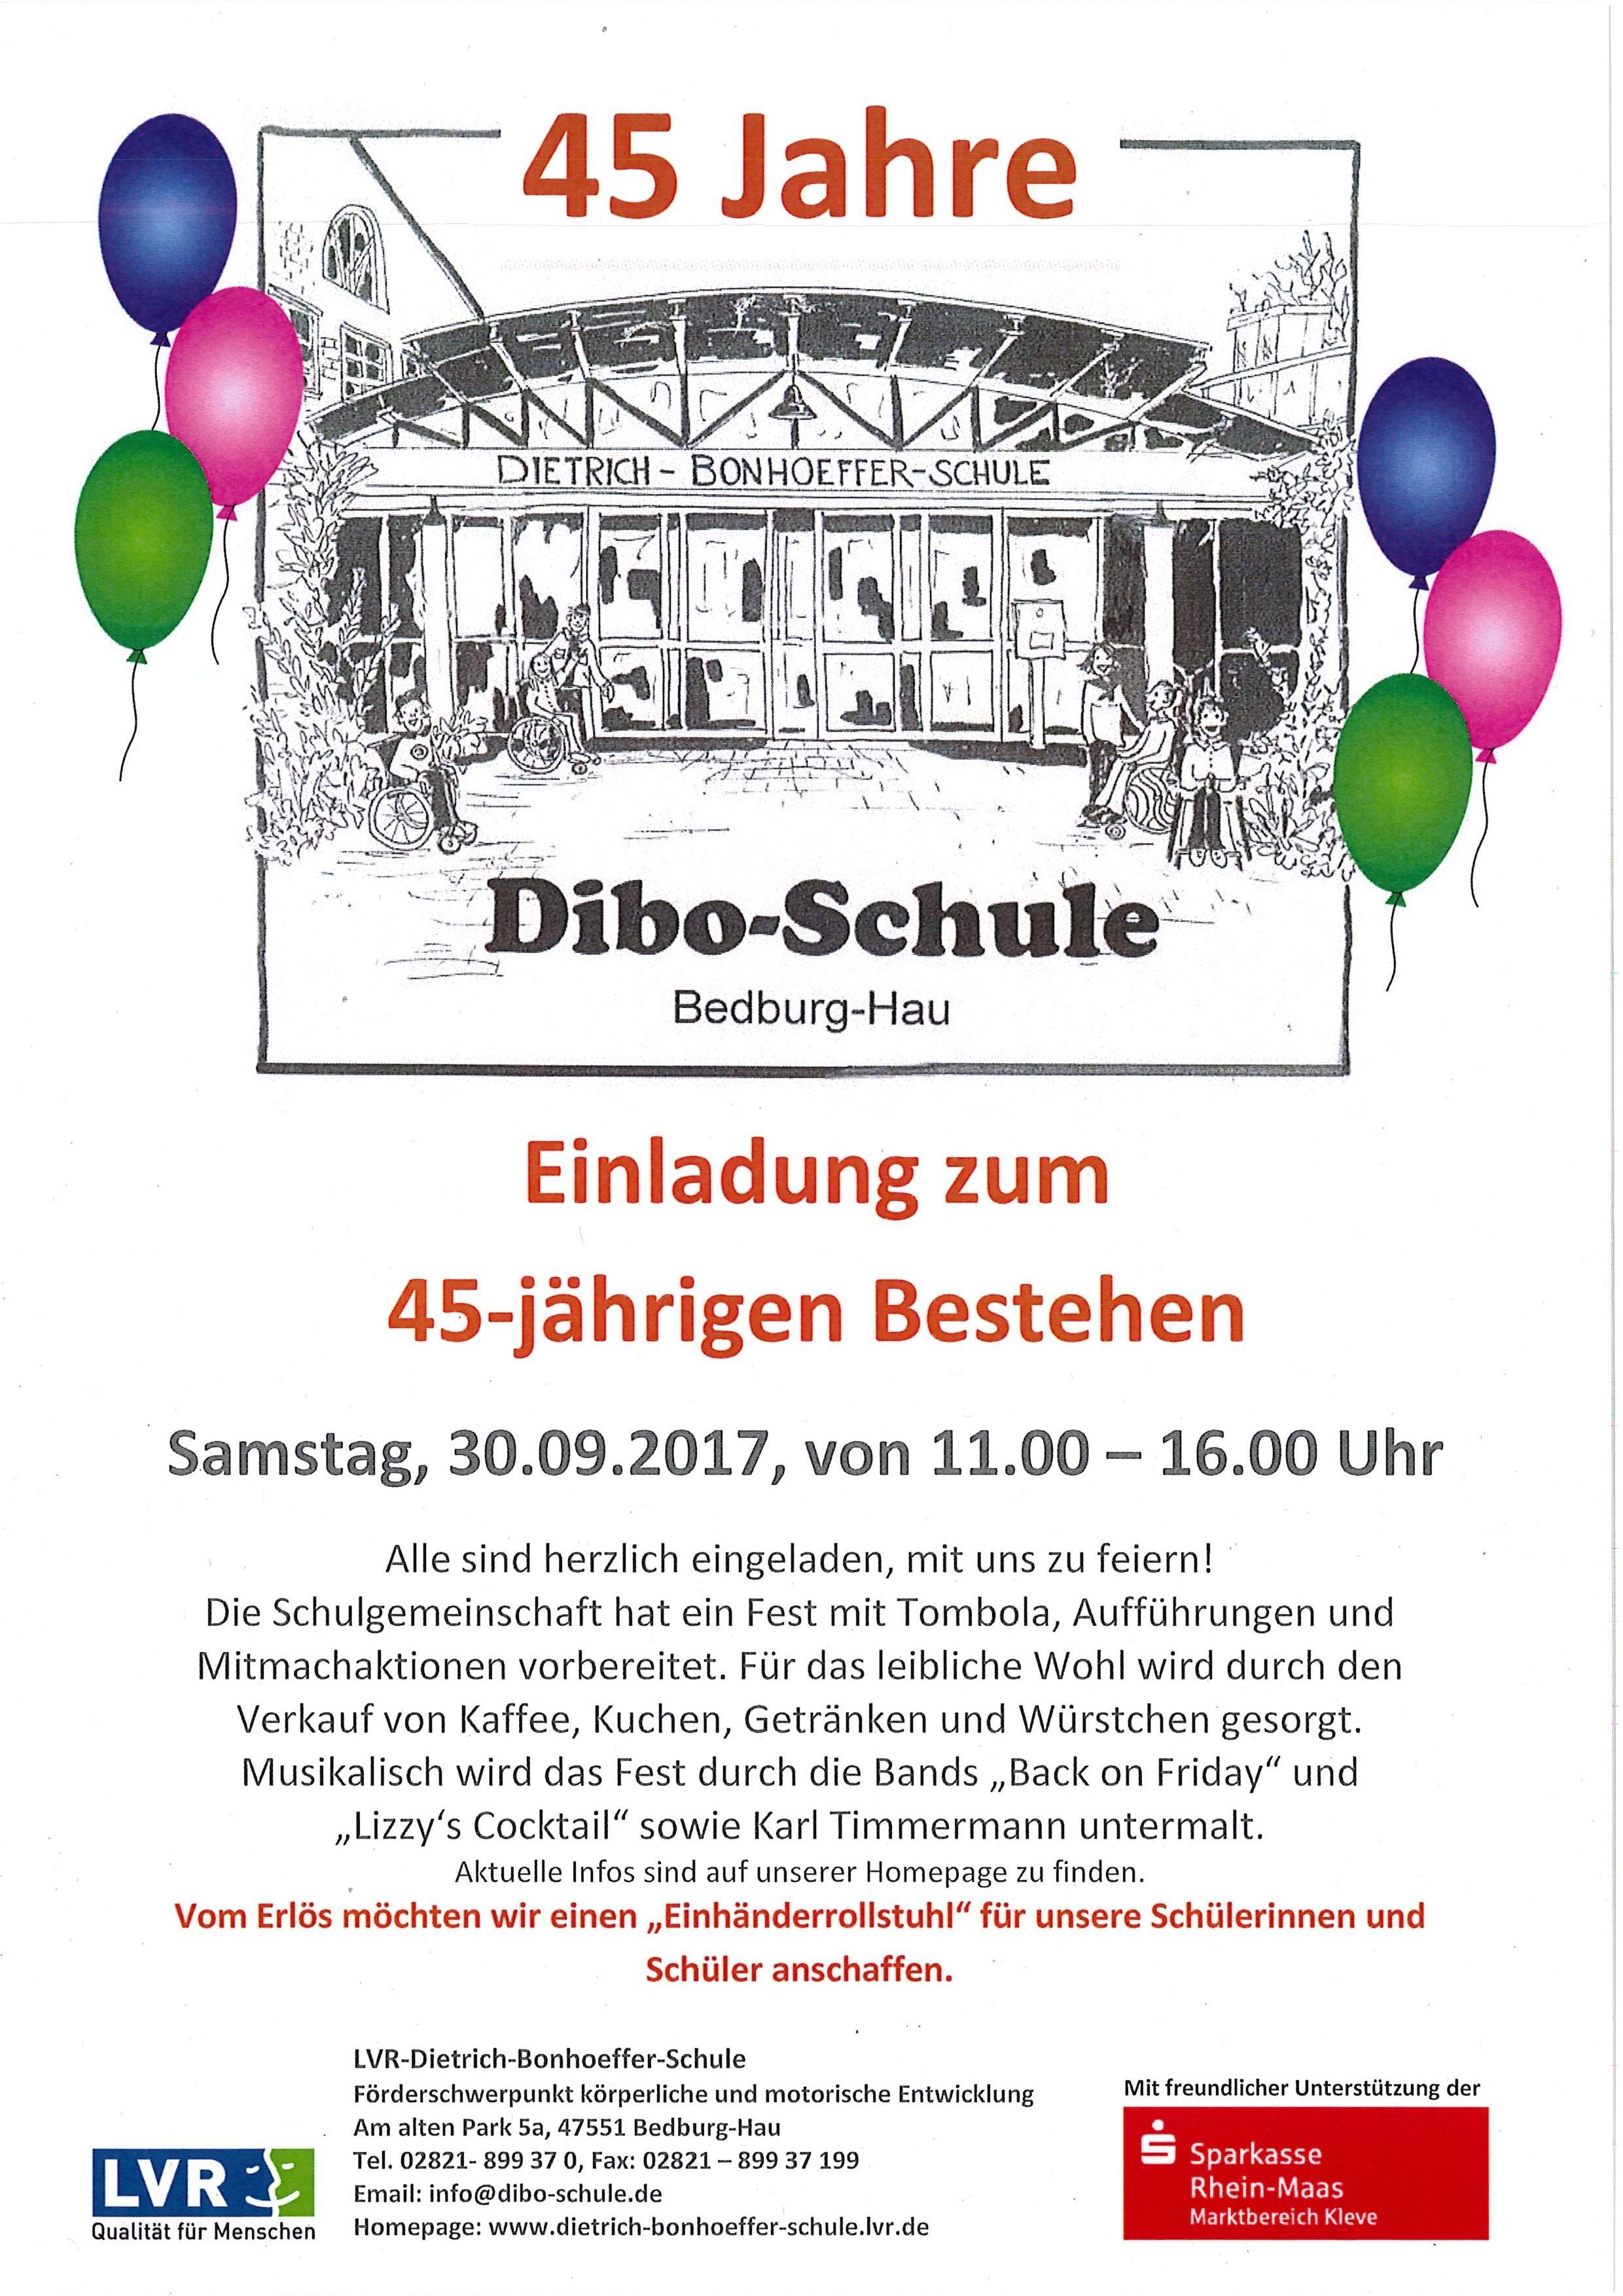 45 Jahre Dibo-Schule - LVR-Dietrich-Bonhoeffer-Schule